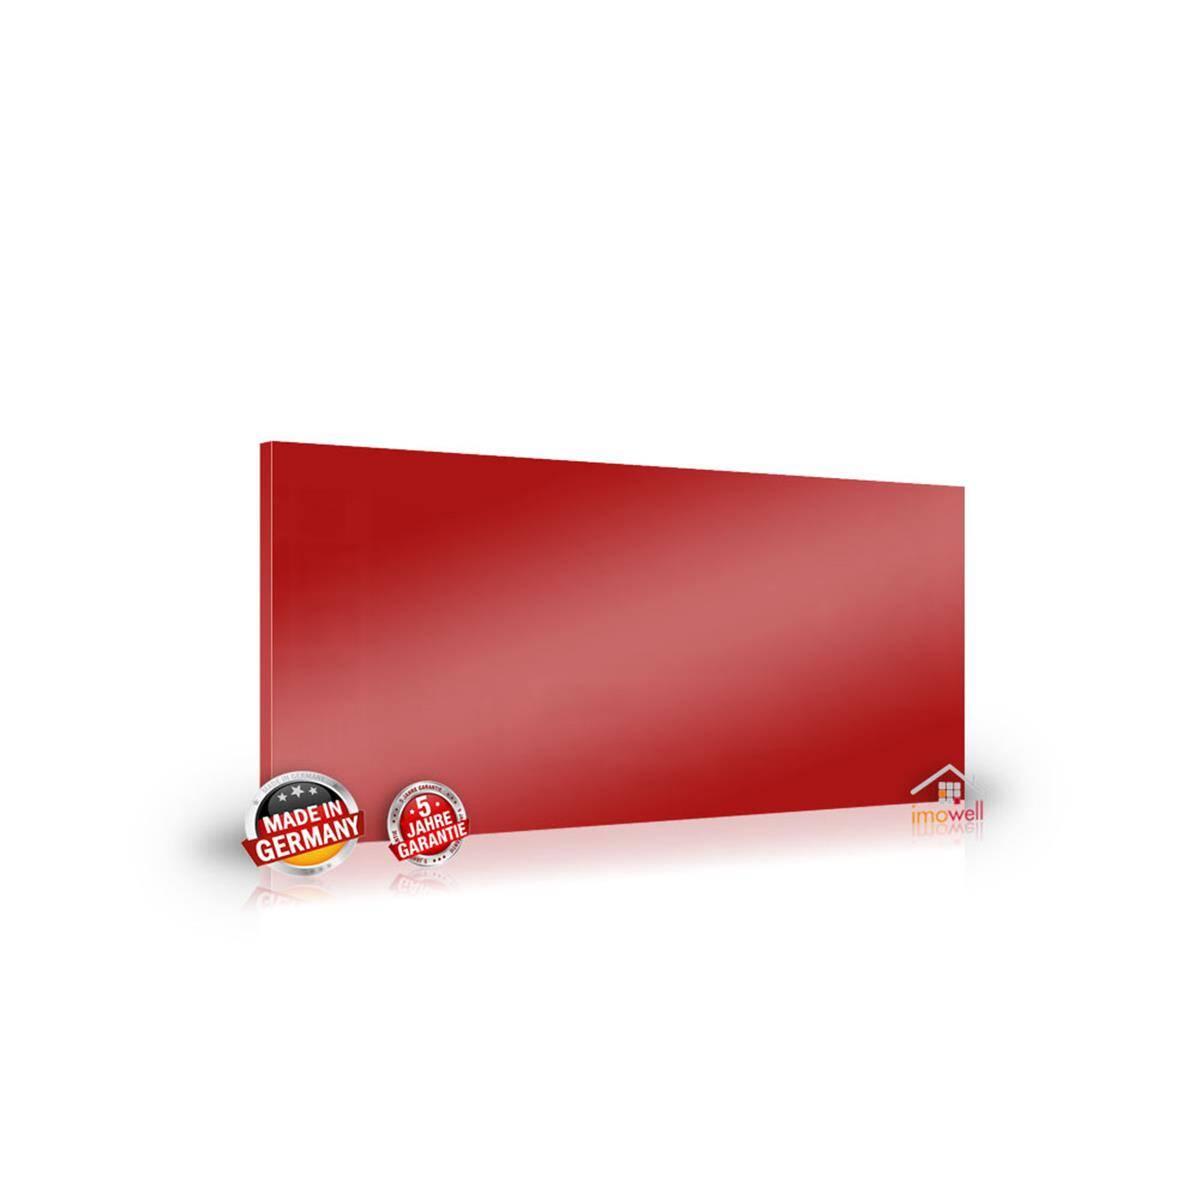 infrarotheizung elbo therm standard 800 watt 449 00. Black Bedroom Furniture Sets. Home Design Ideas